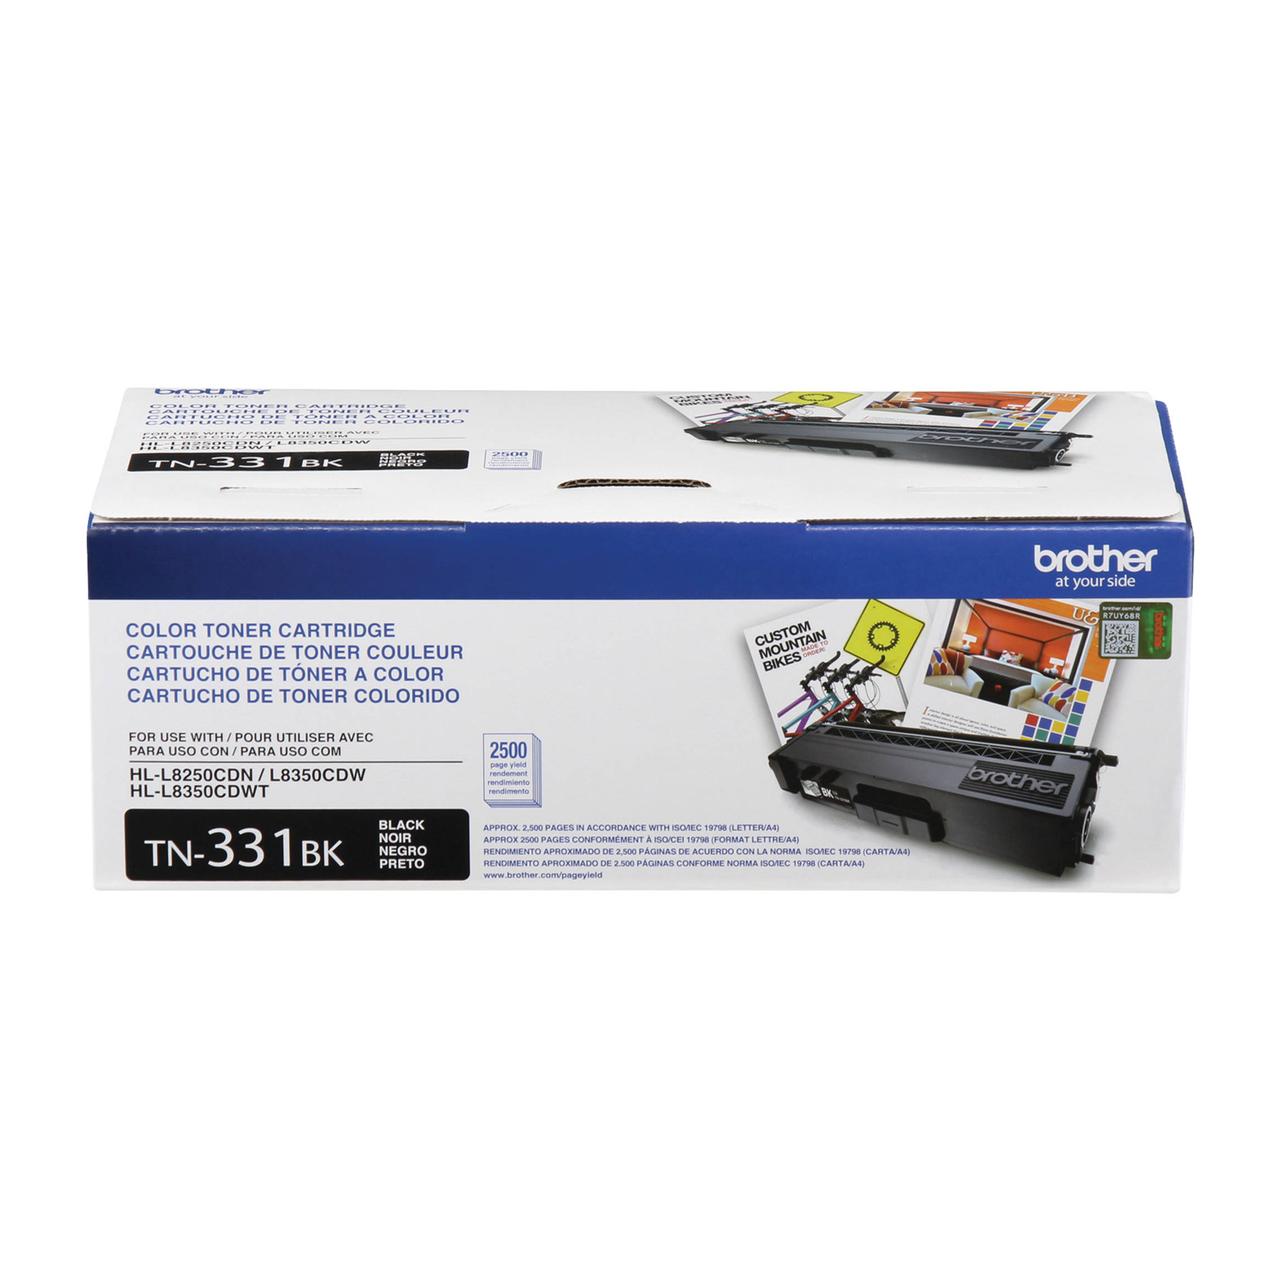 TN-331BK | Original Brother Toner Cartridge – Black